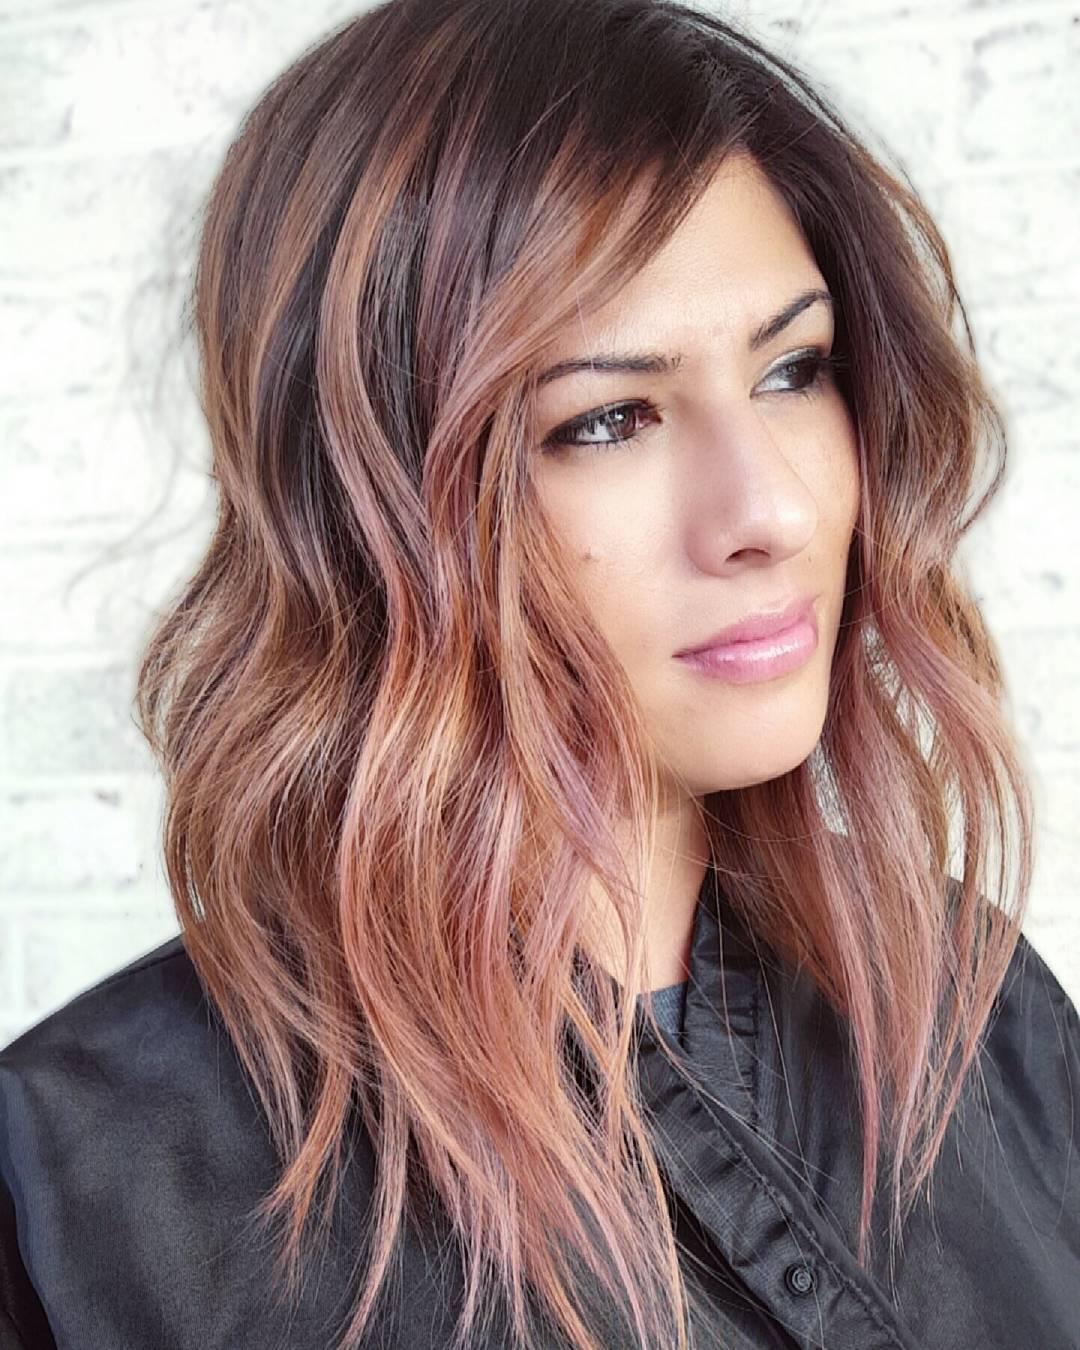 100 Cute Hairstyles For Long Hair (2018 Trend Alert)